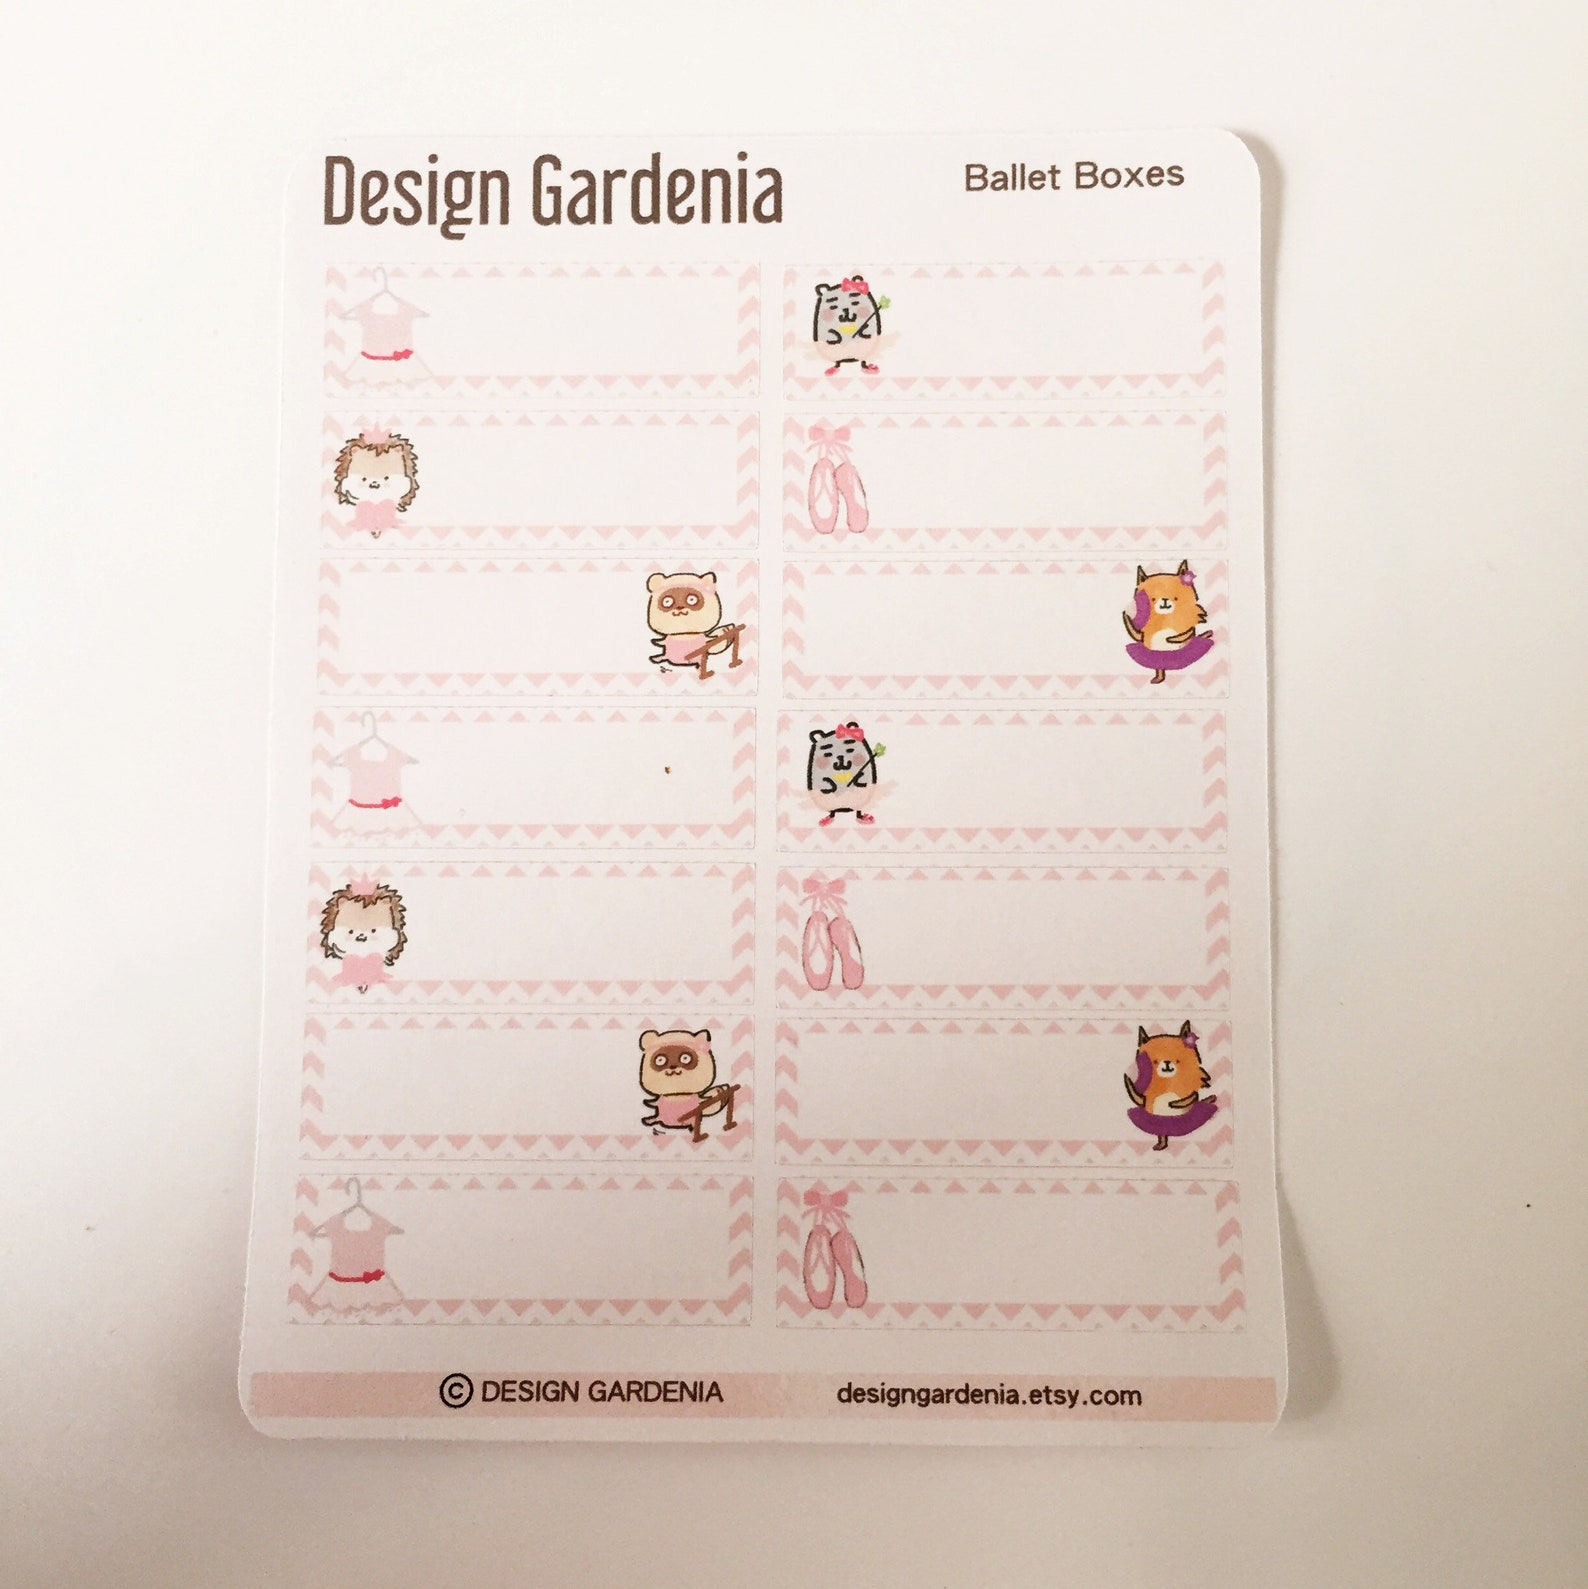 ballet boxes stickers • ballerina • tutu • designgardenia • leotard • pointe shoes • barre • exercise • practice • class • class